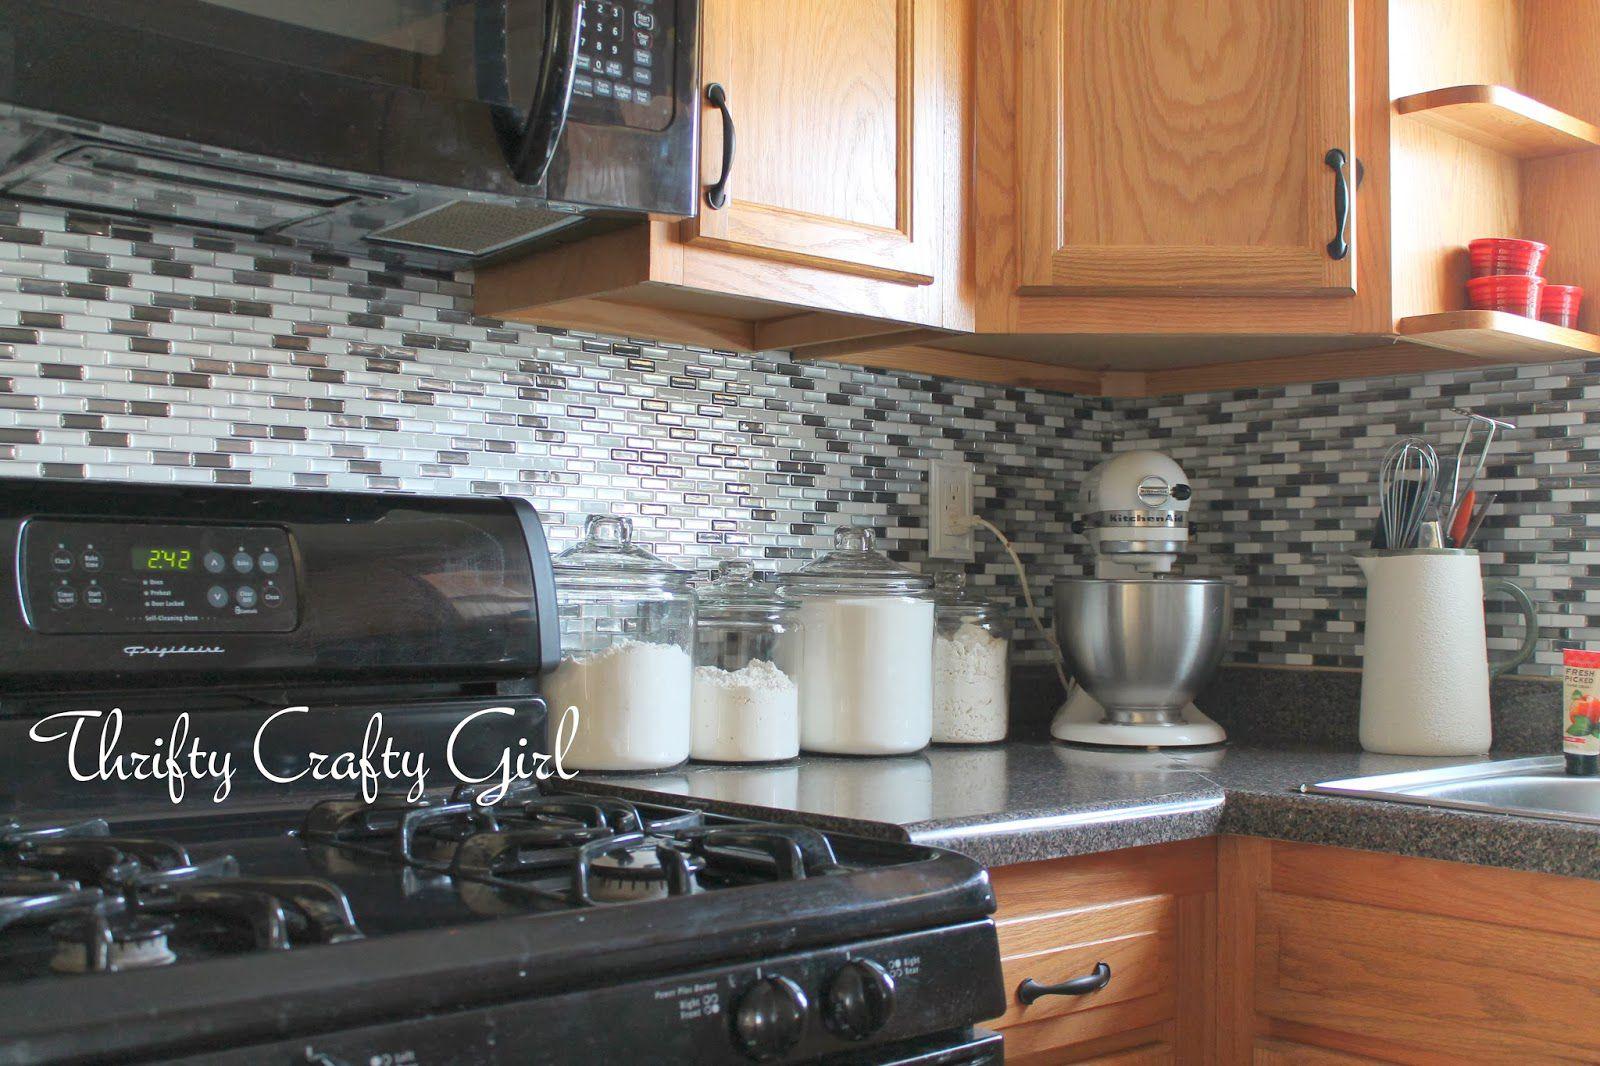 13 Removable Kitchen Backsplash Ideas on removable contact paper, removable backsplash behind cooktops, removable kitchen storage, removable countertops, removable glass backsplash, removable kitchen sink, removable kitchen island, removable tile appliques,